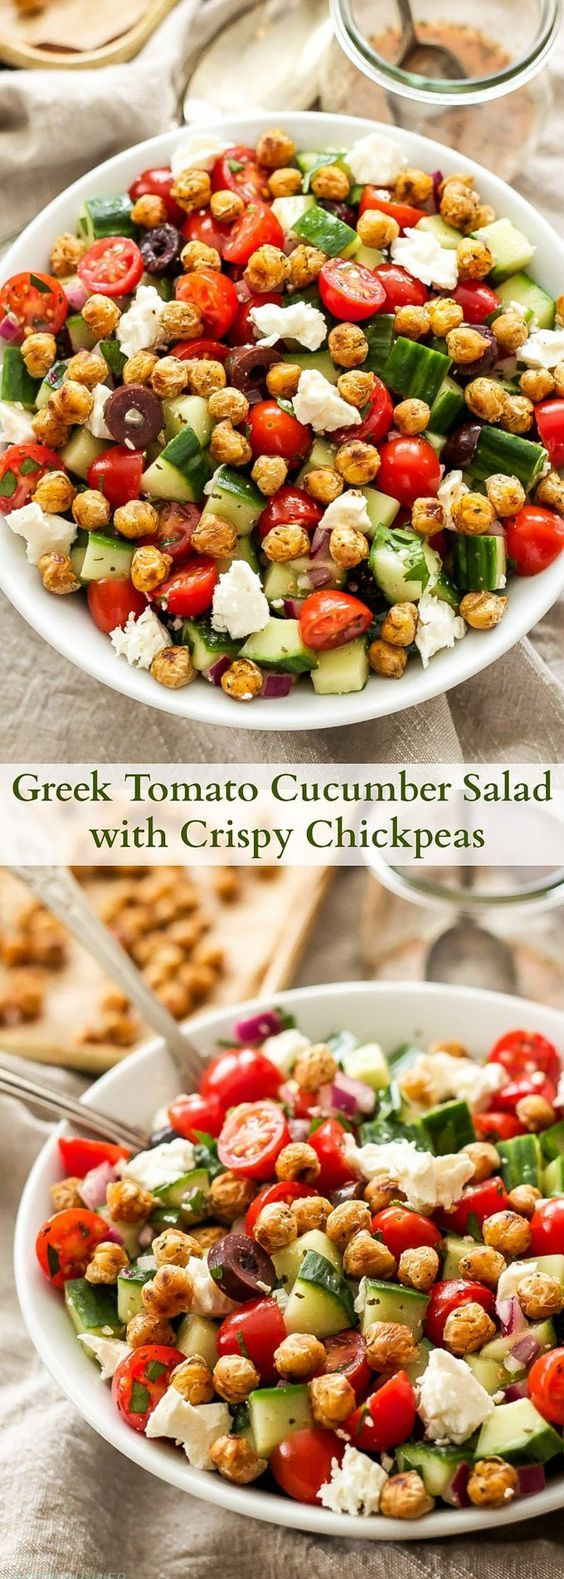 Greek Tomato Cucumber Salad with Crispy Chickpeas   Crispy pan sauteed chickpeas…: